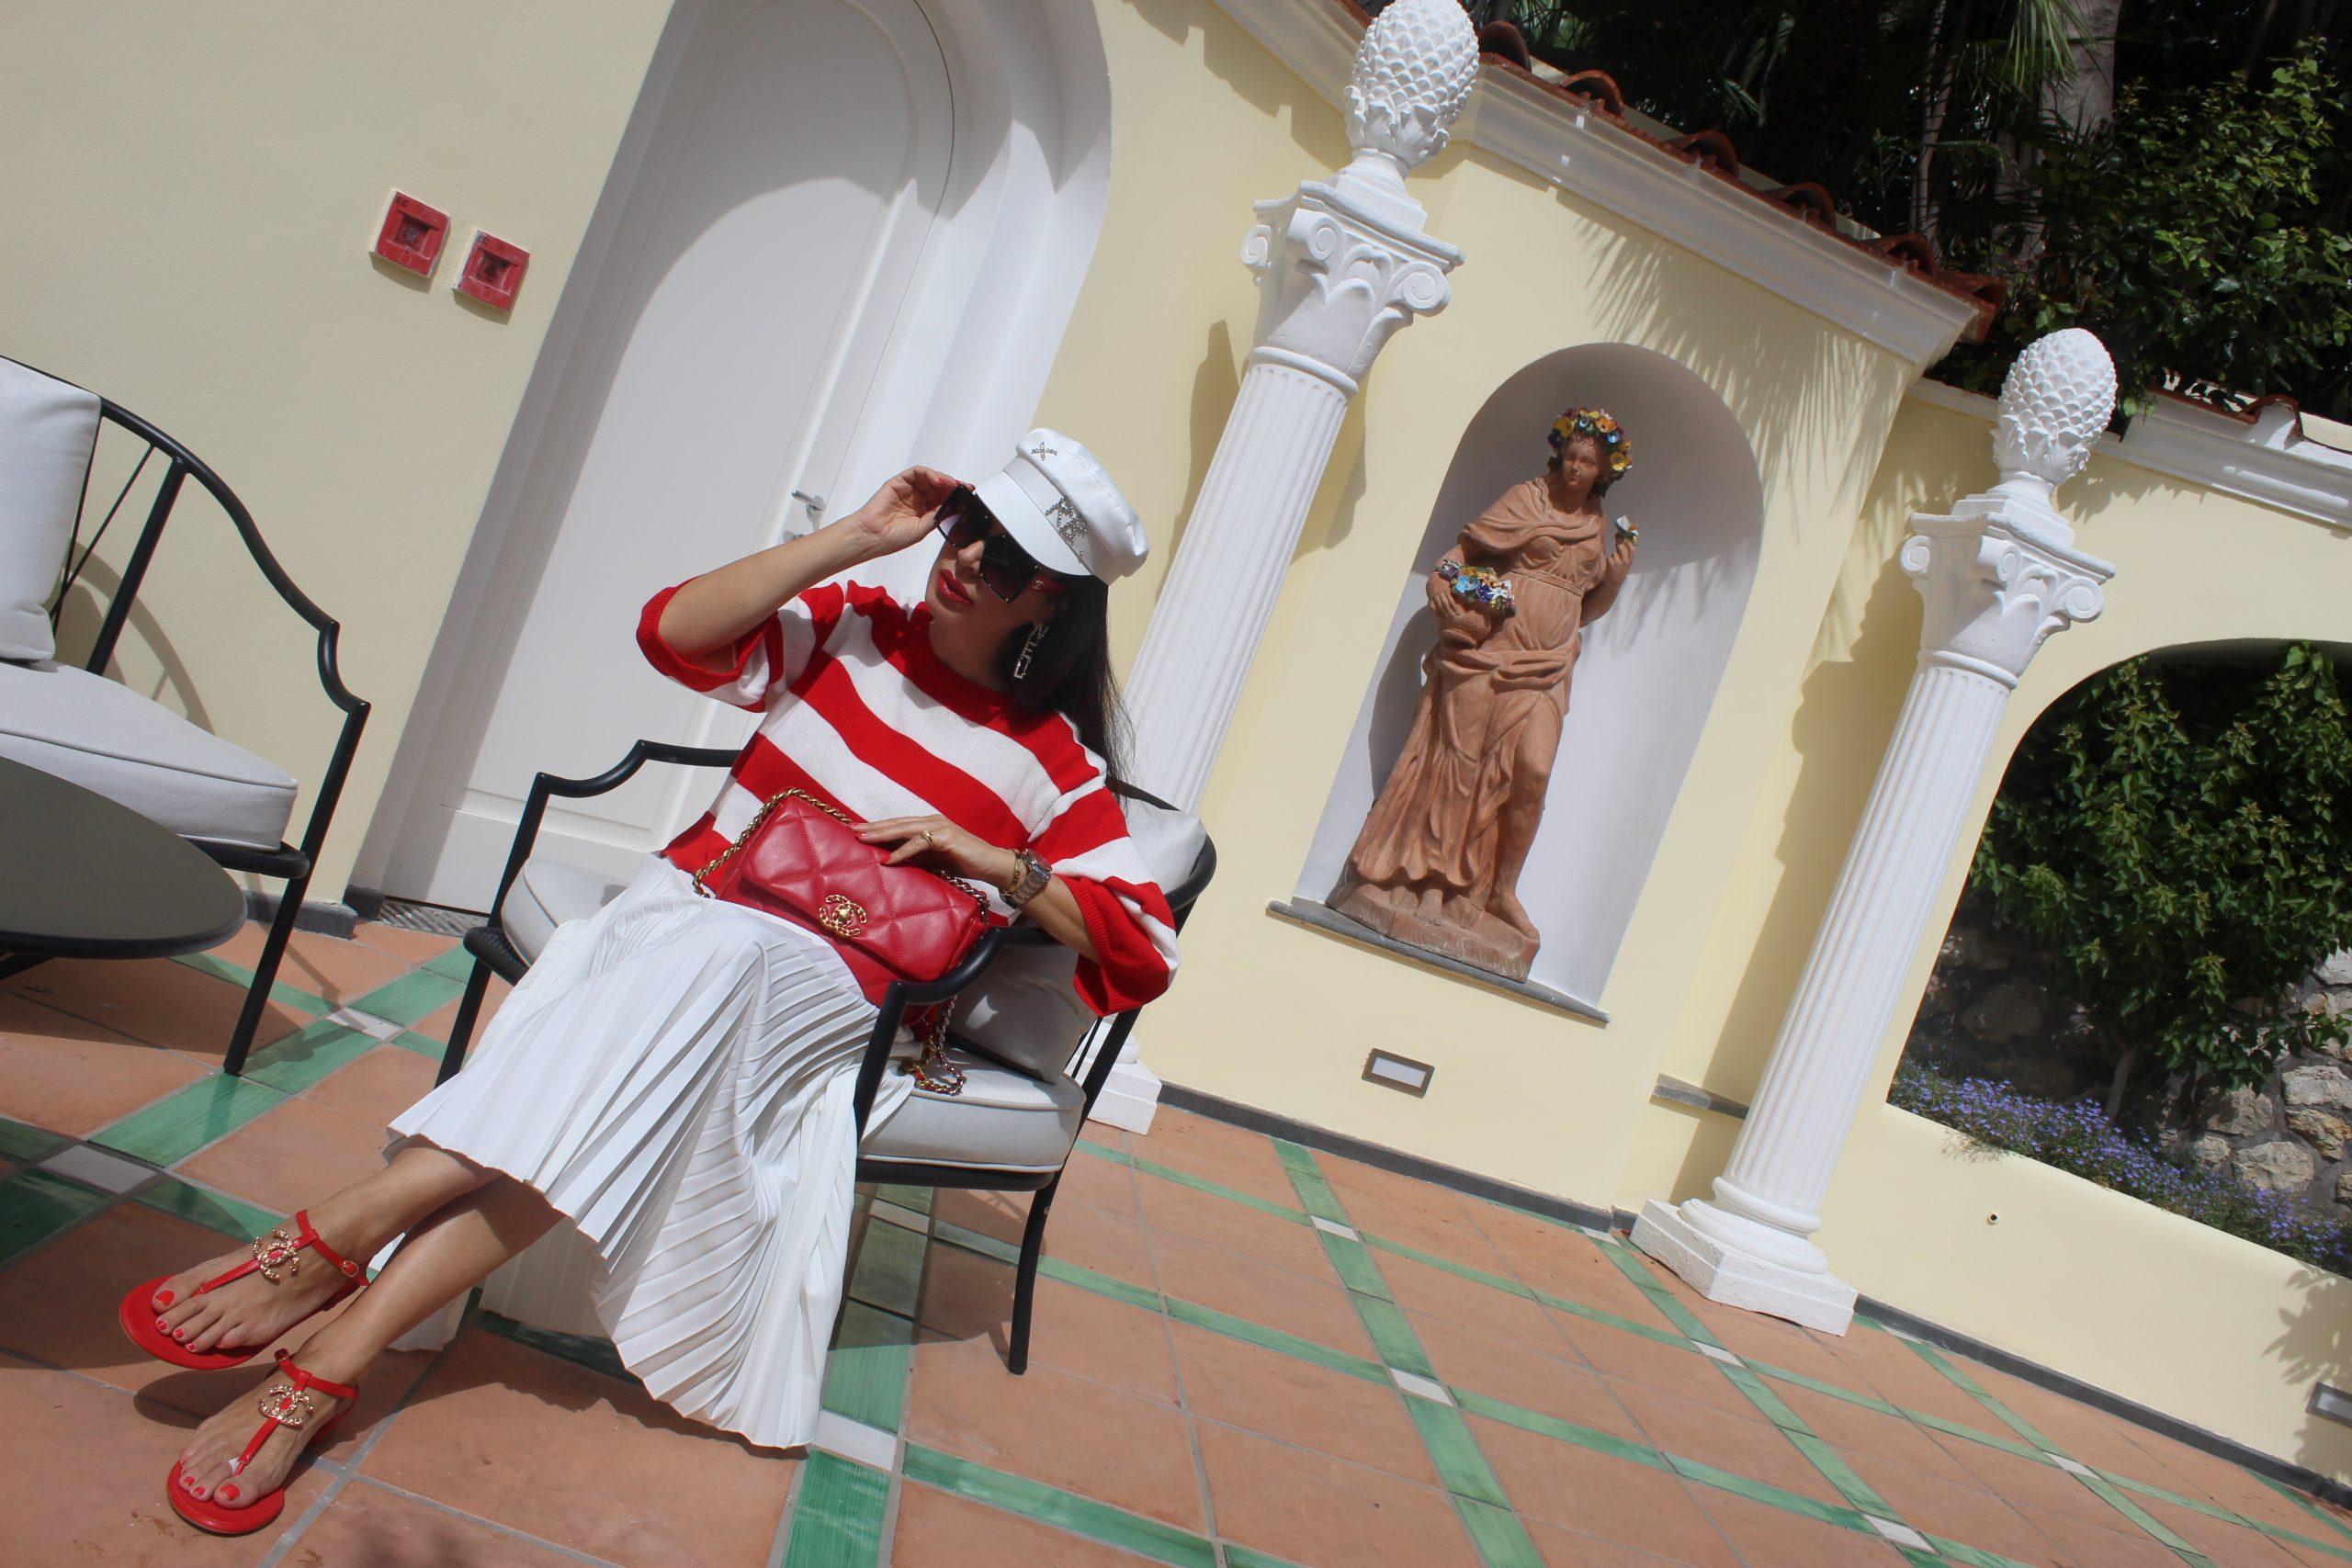 Capri Island Summer Italian Vacation Navy Look White and Red Trend Chanel Paola Lauretano